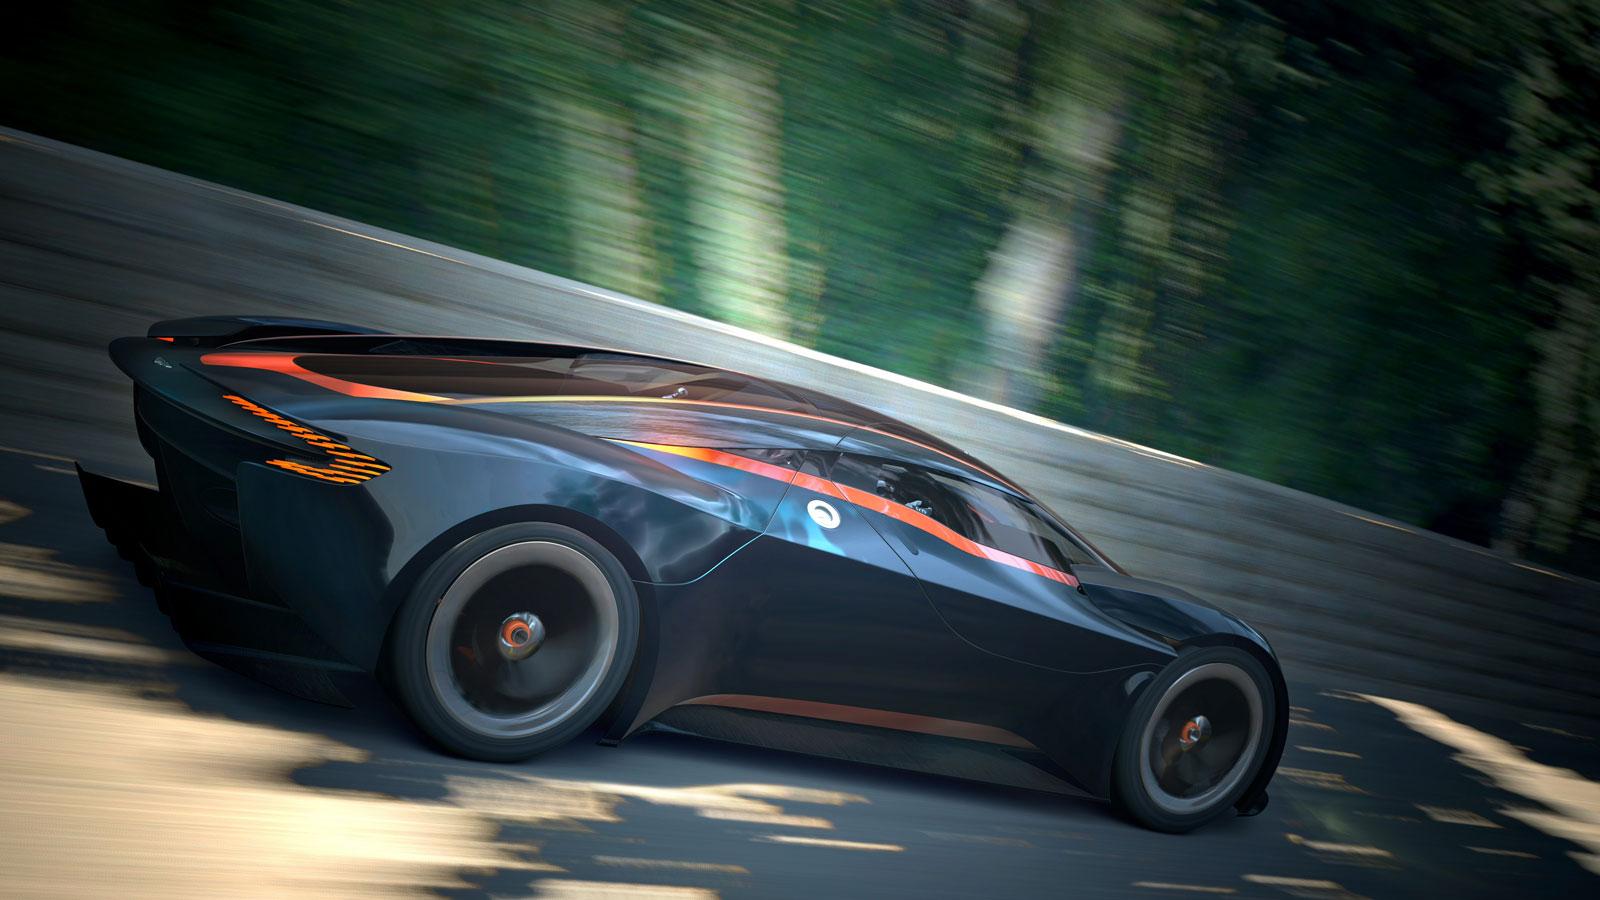 Aston Martin DP 100 Vision GT